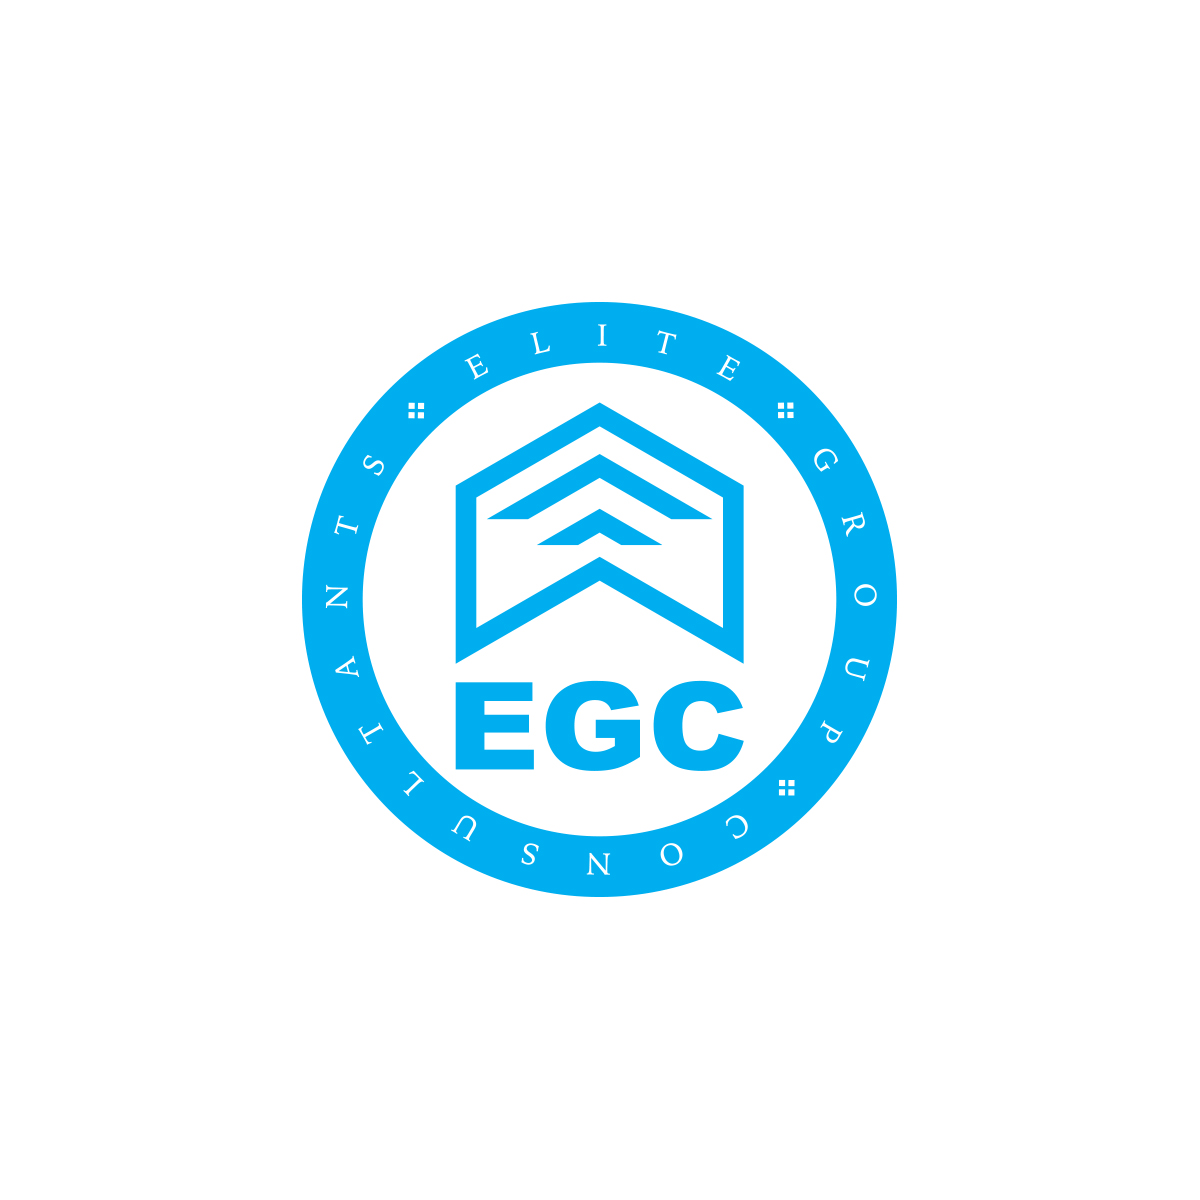 PENTAGON_STUDIO_EGC.jpg